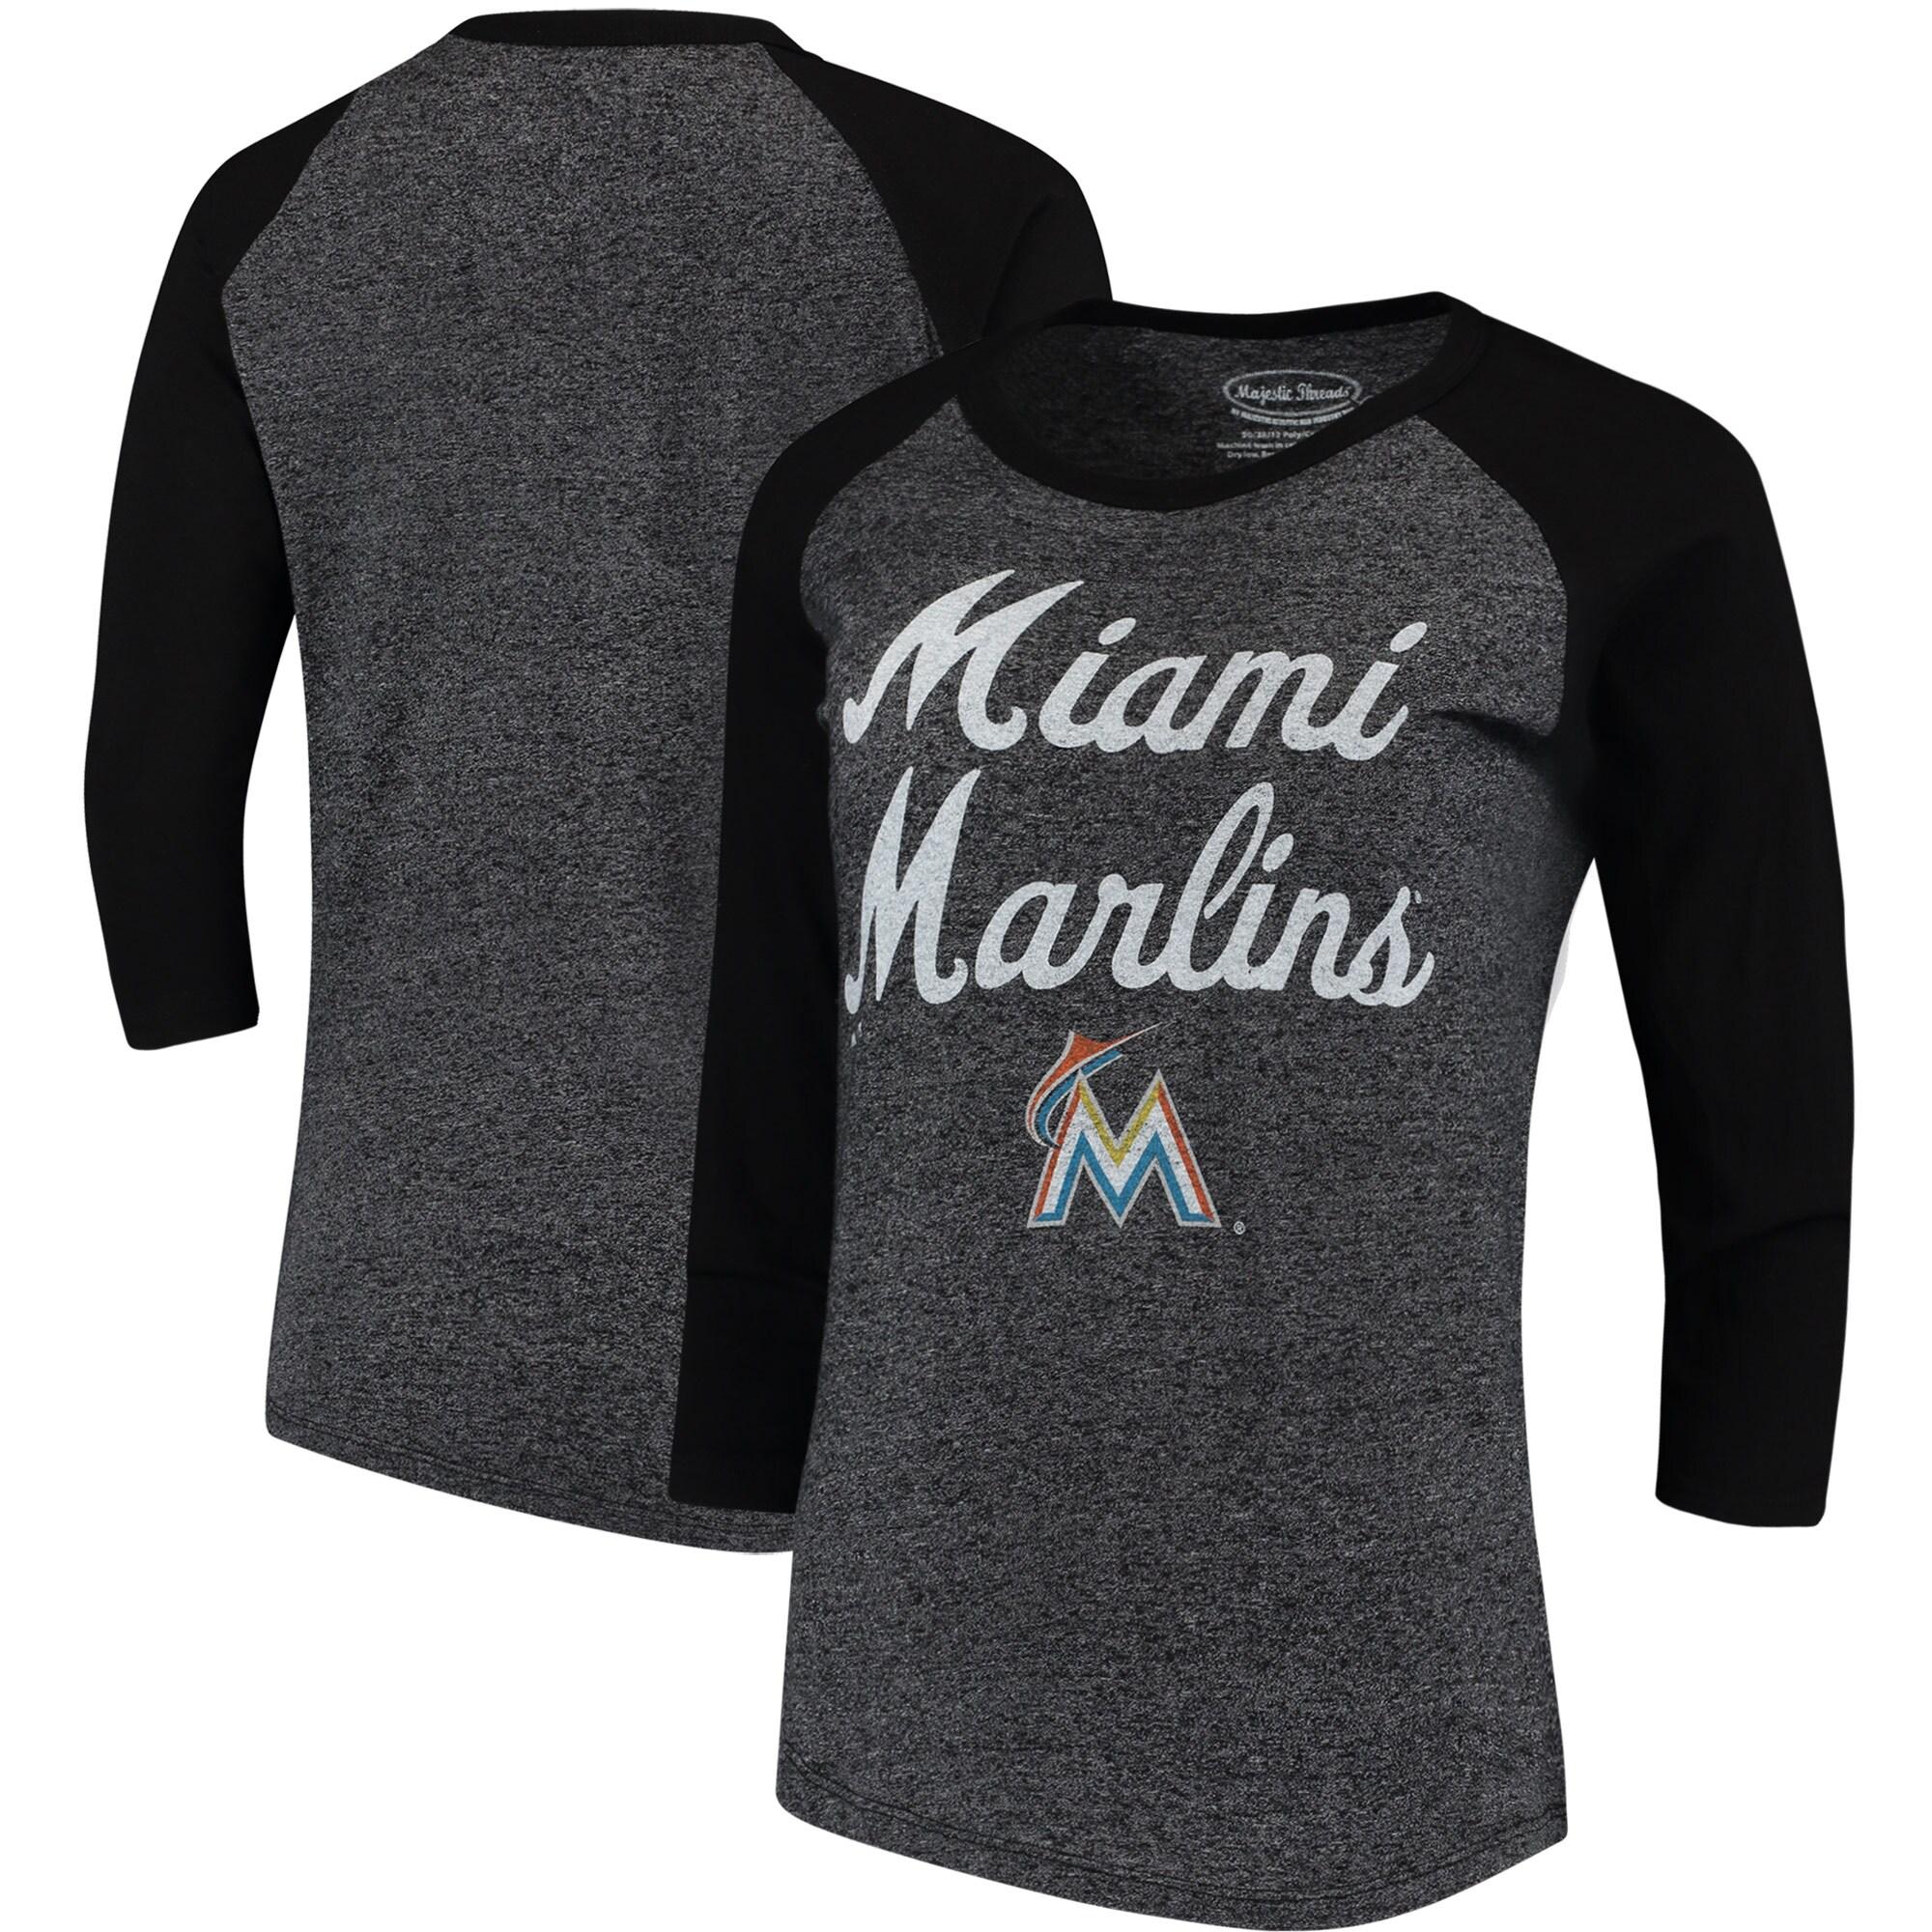 Miami Marlins Majestic Threads Women's 3/4-Sleeve Raglan T-Shirt - Black